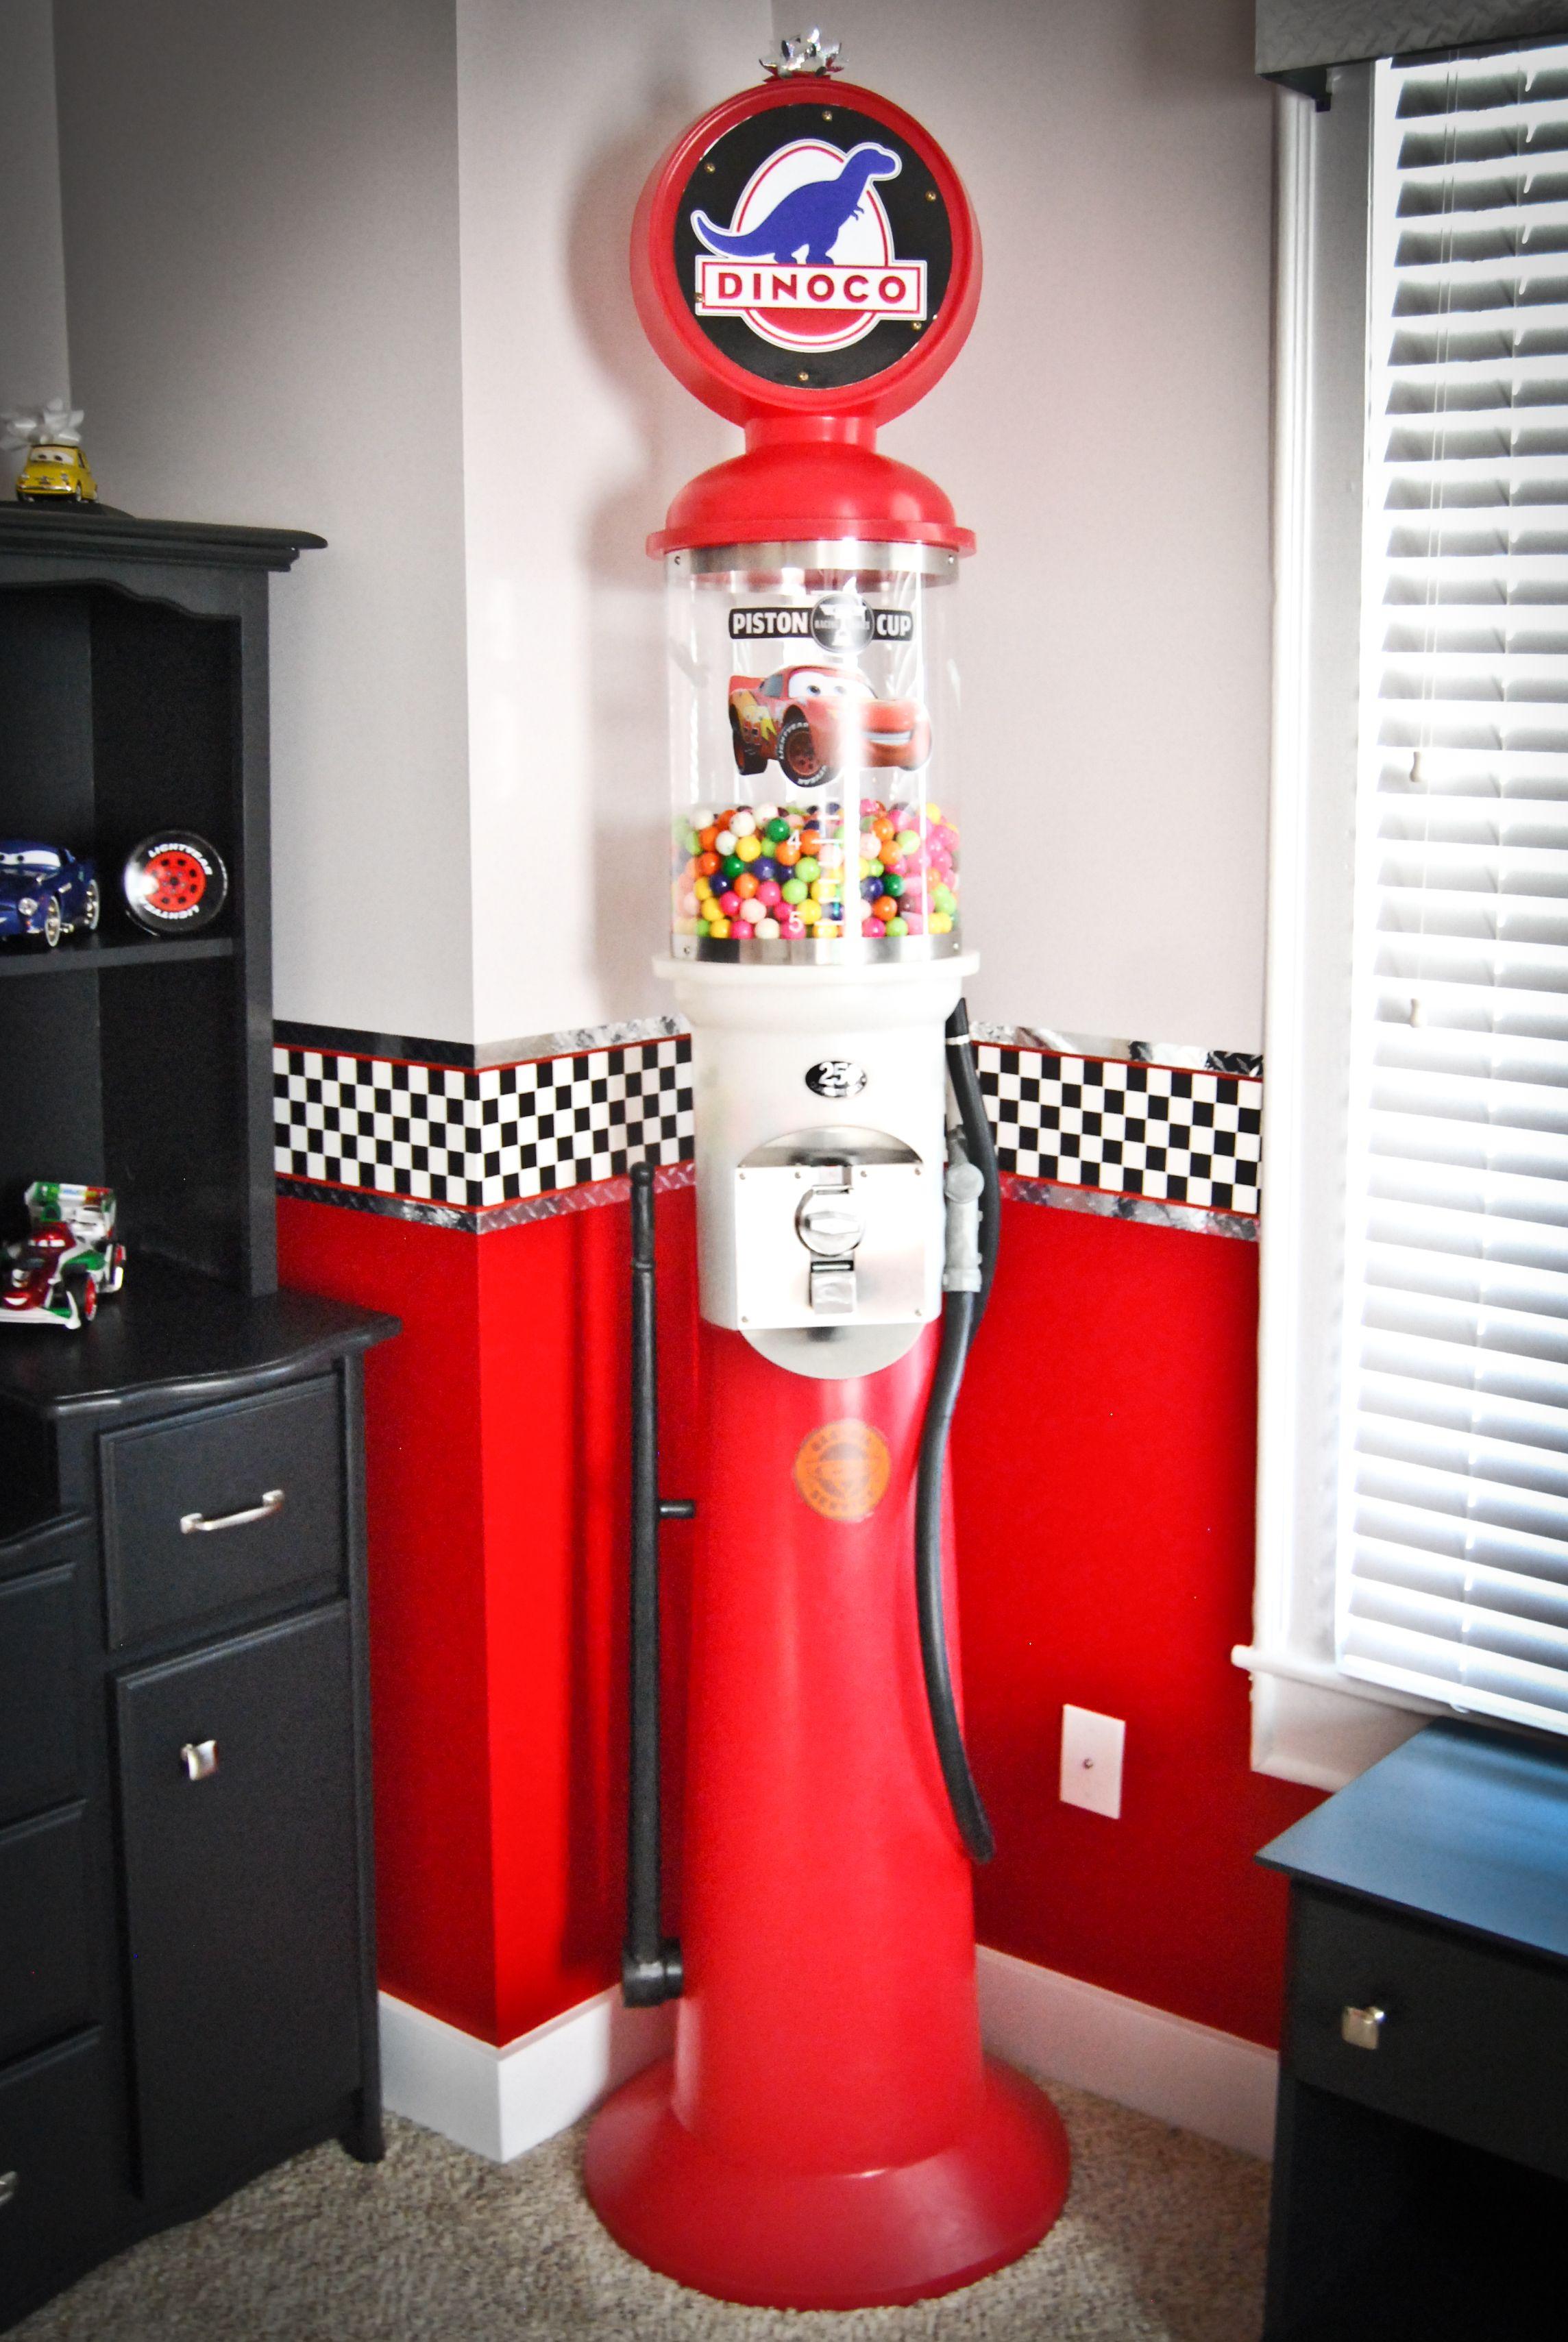 7ft tall gas pump gumball machine with custom Dinoco logo ...